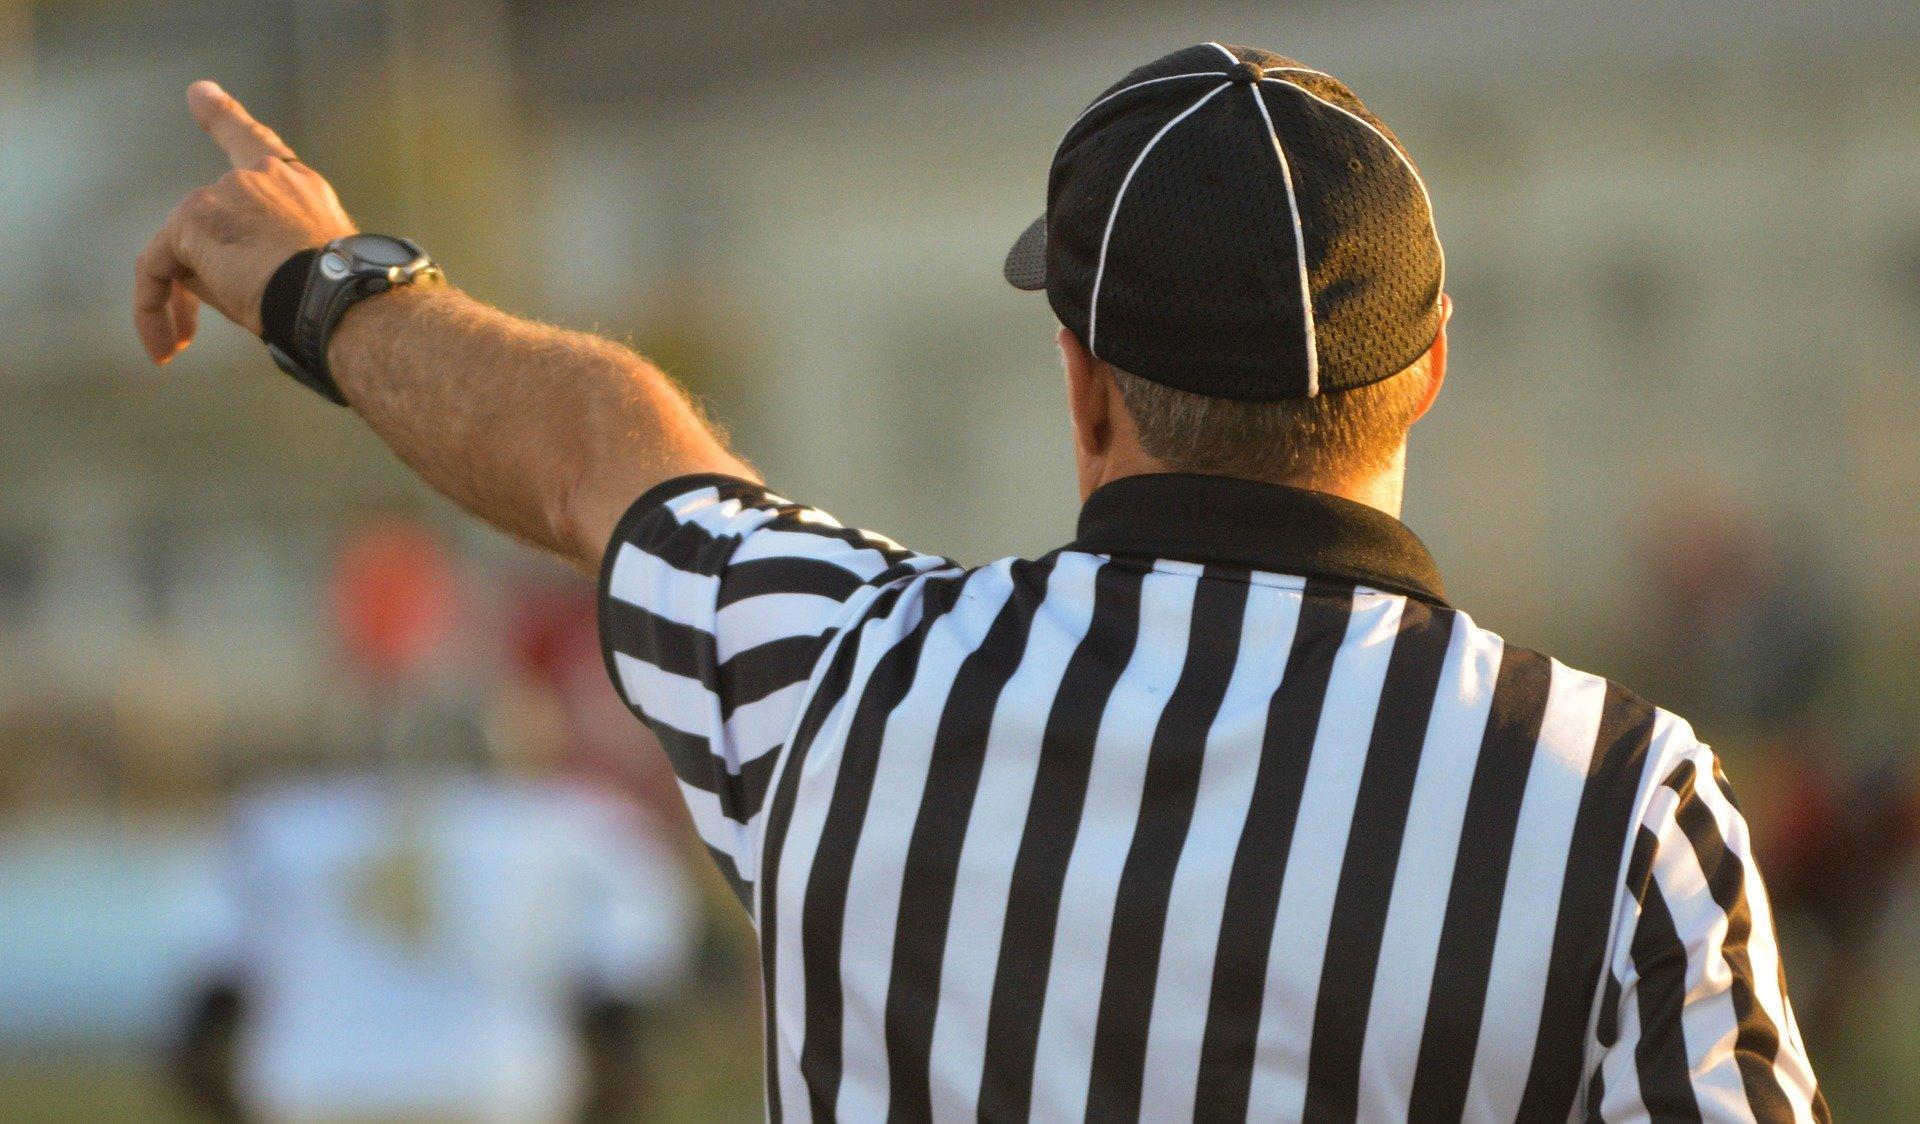 referee-1149014_1920.jpg